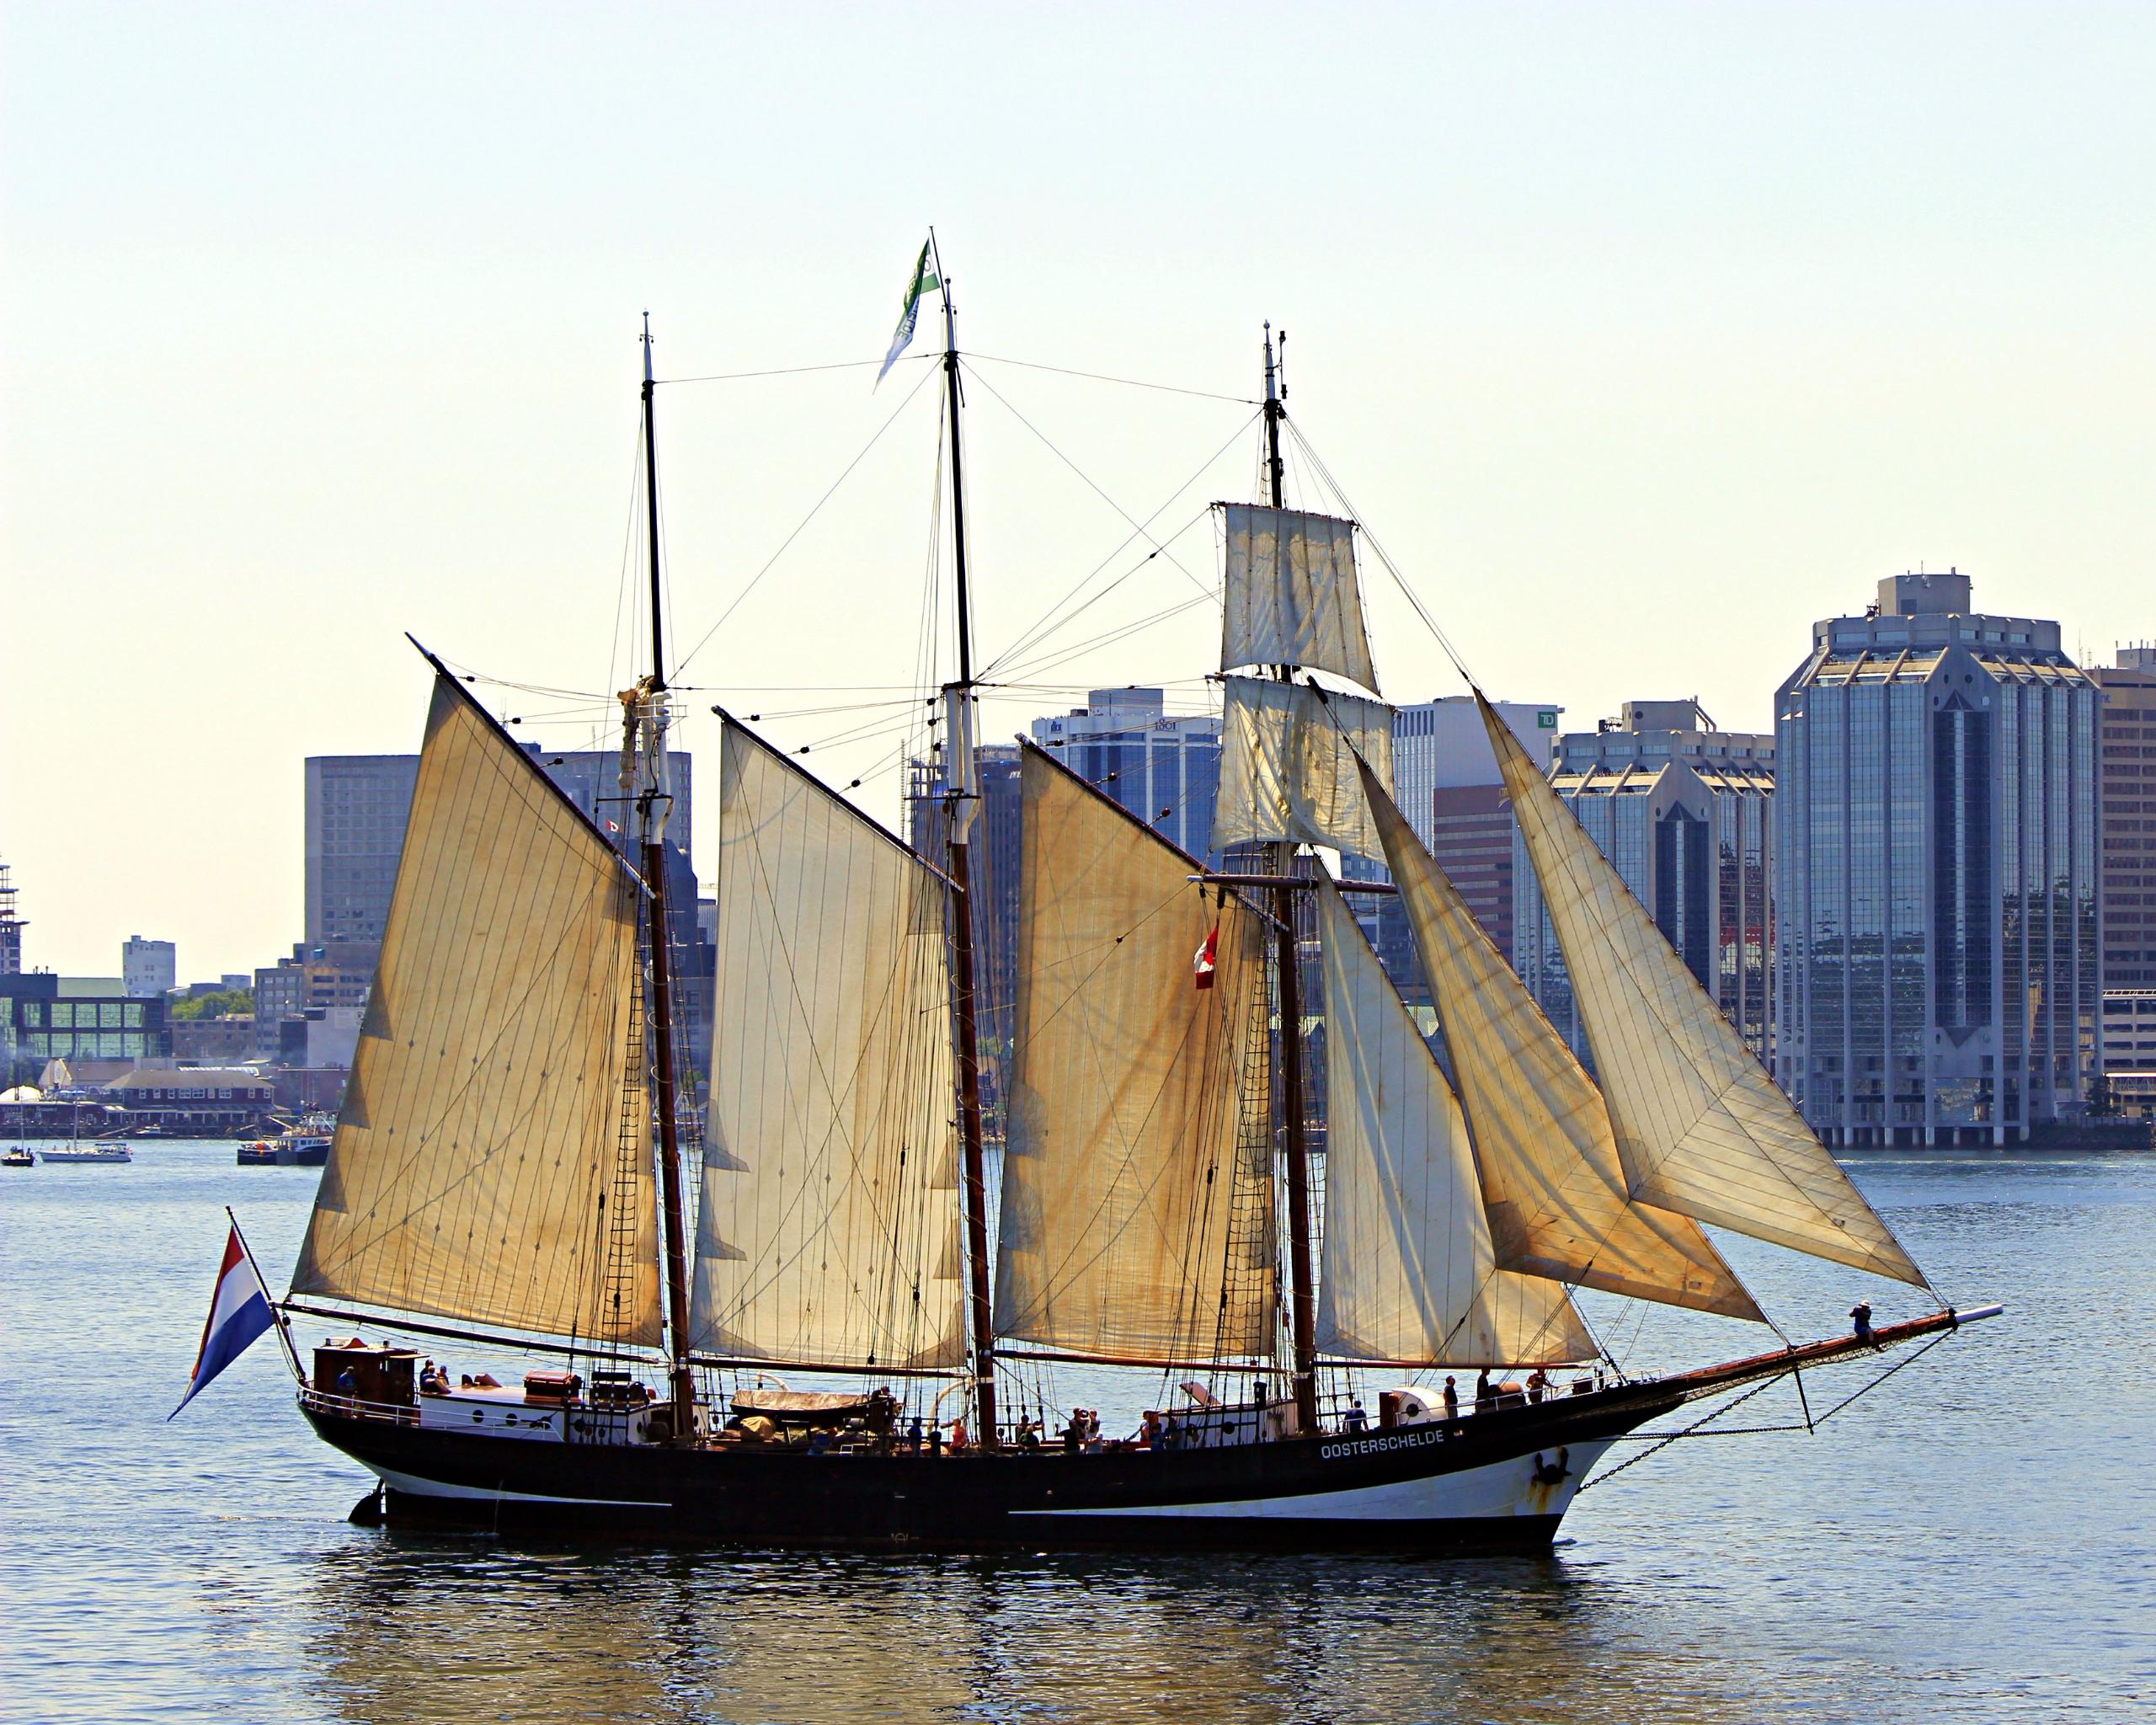 Parade Sail Halifax Harbour - A - brucefraser | ello